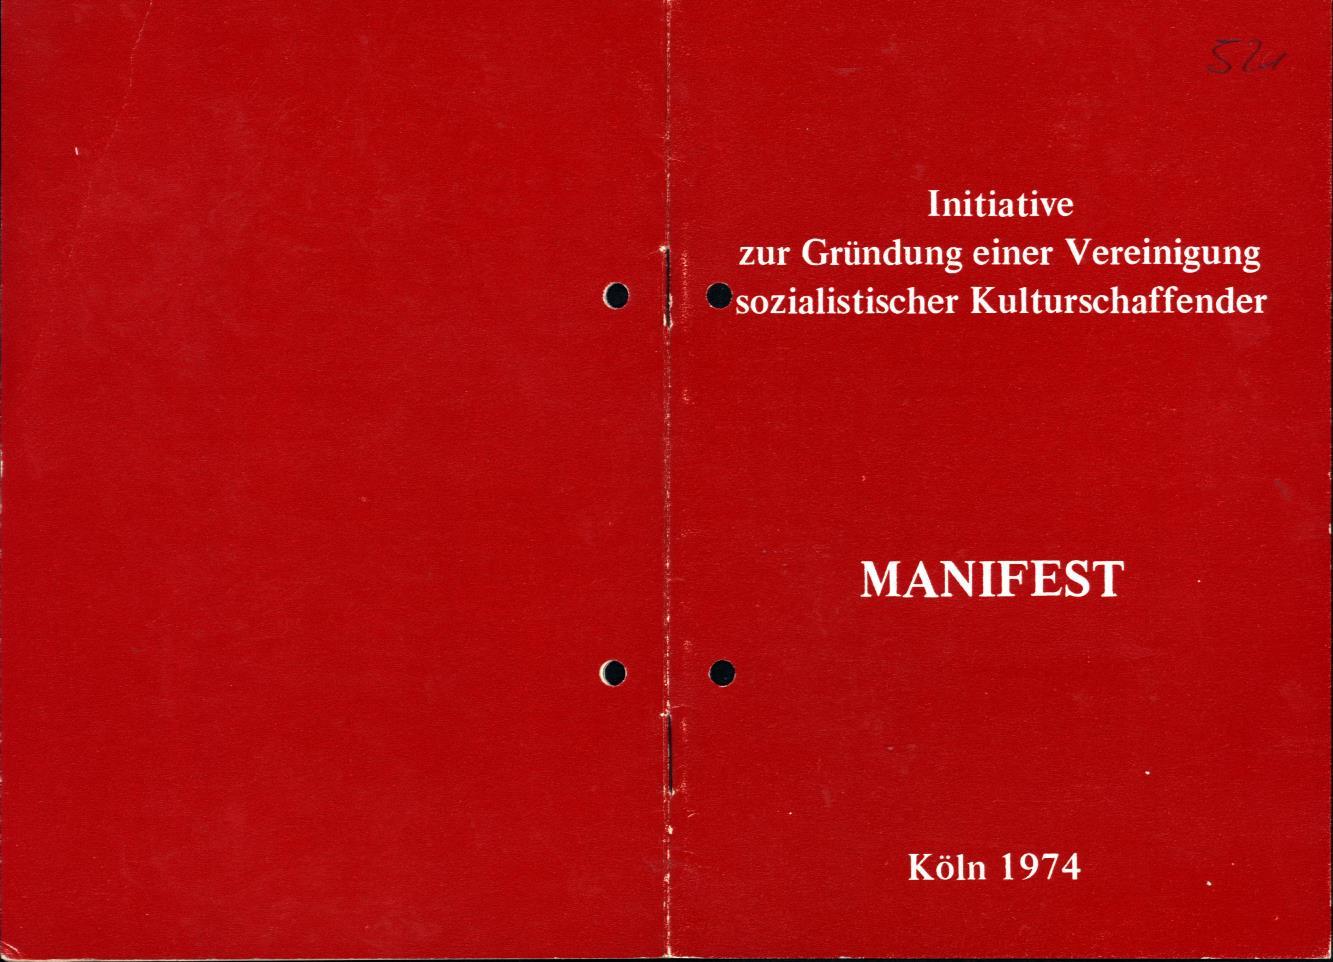 VSK_1974_Manifest_01